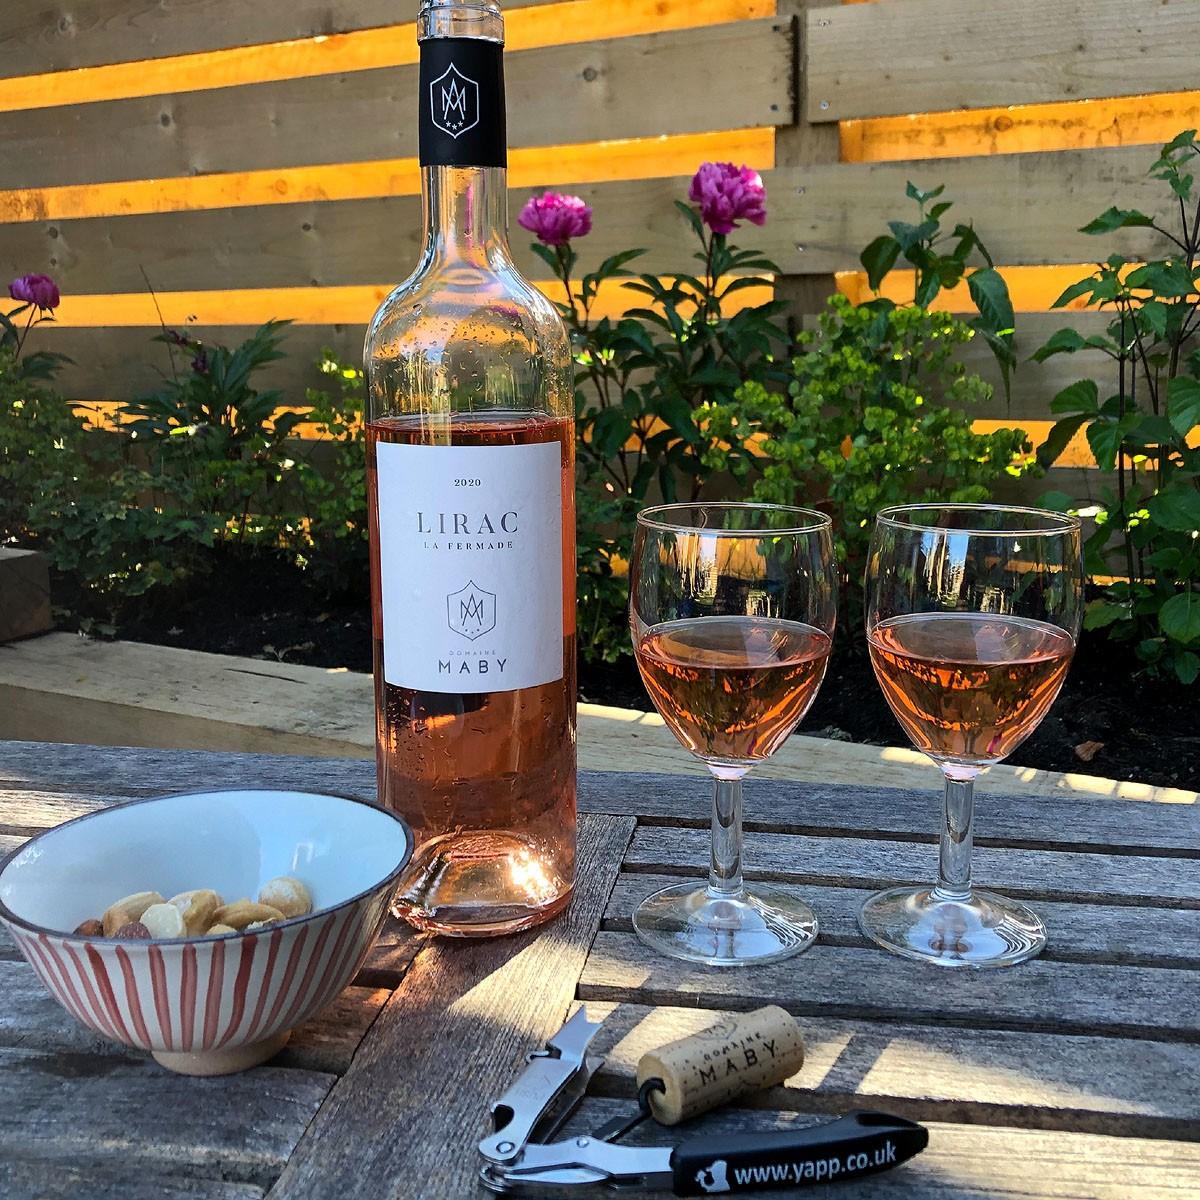 Lirac: Domaine Maby 'La Fermade' Rosé 2020 - Lifestyle